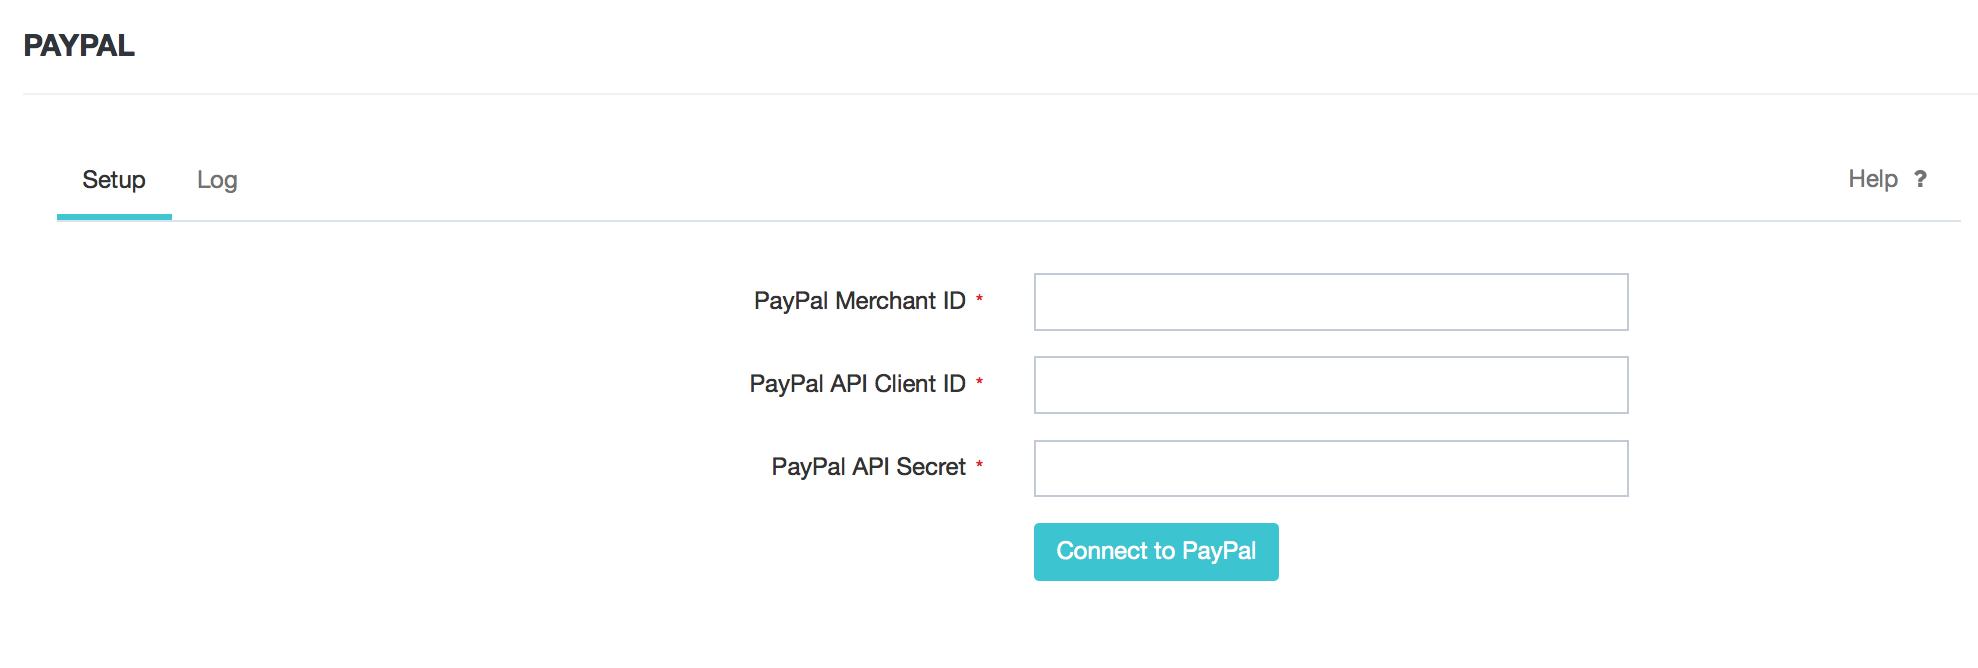 Paypal Integration : DEAR Support Team